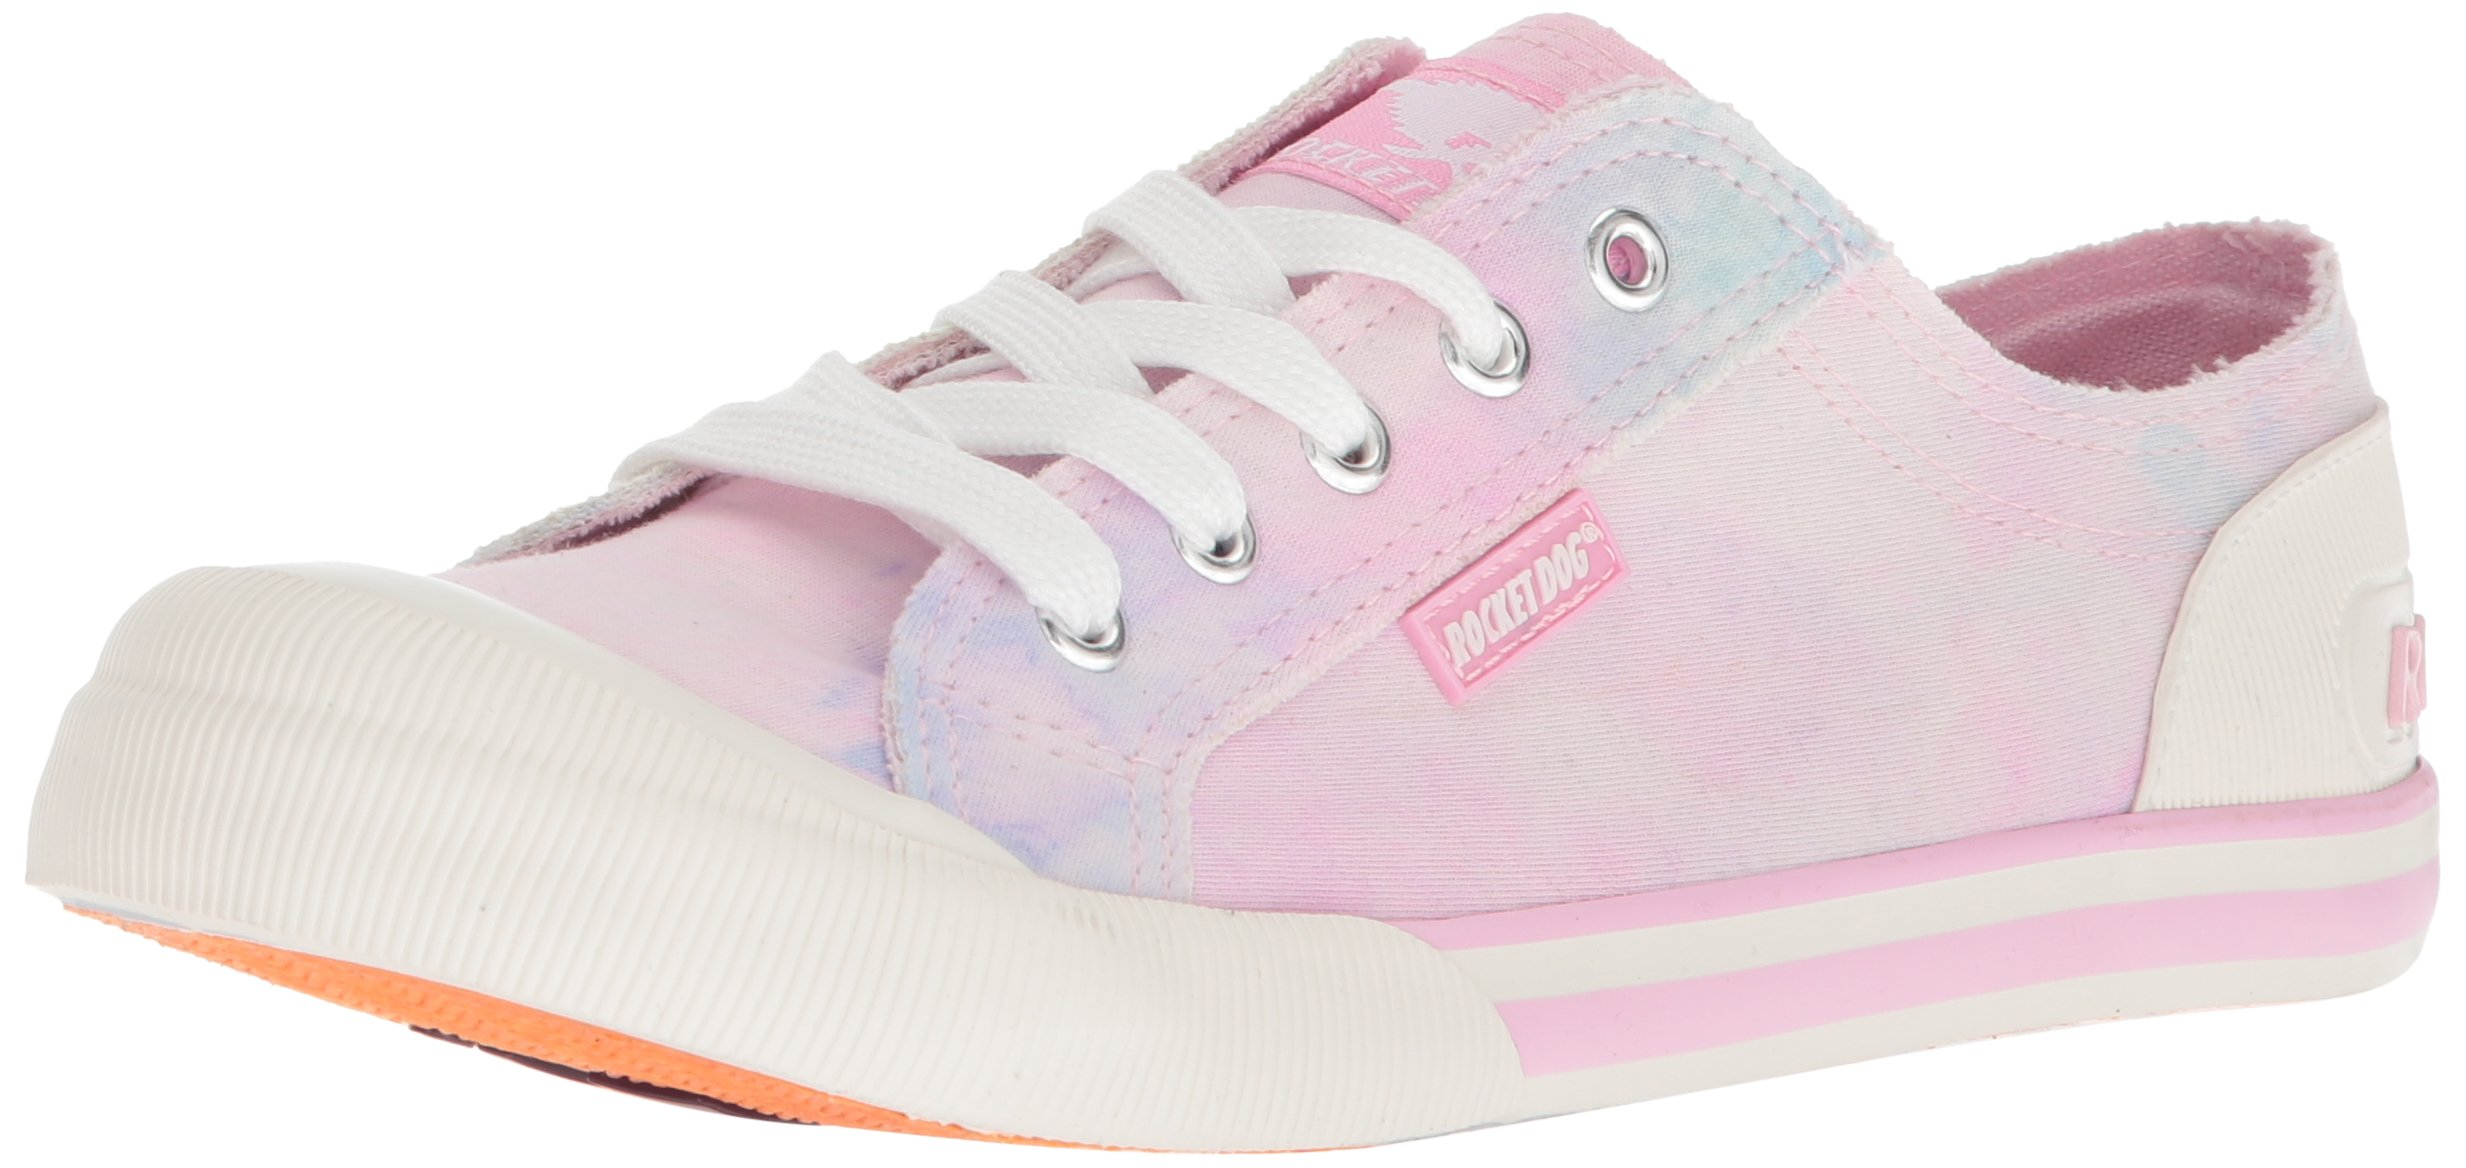 Rocket Dog Women's Jazzin Vision Cotton Sneaker, Pink, 8 M US